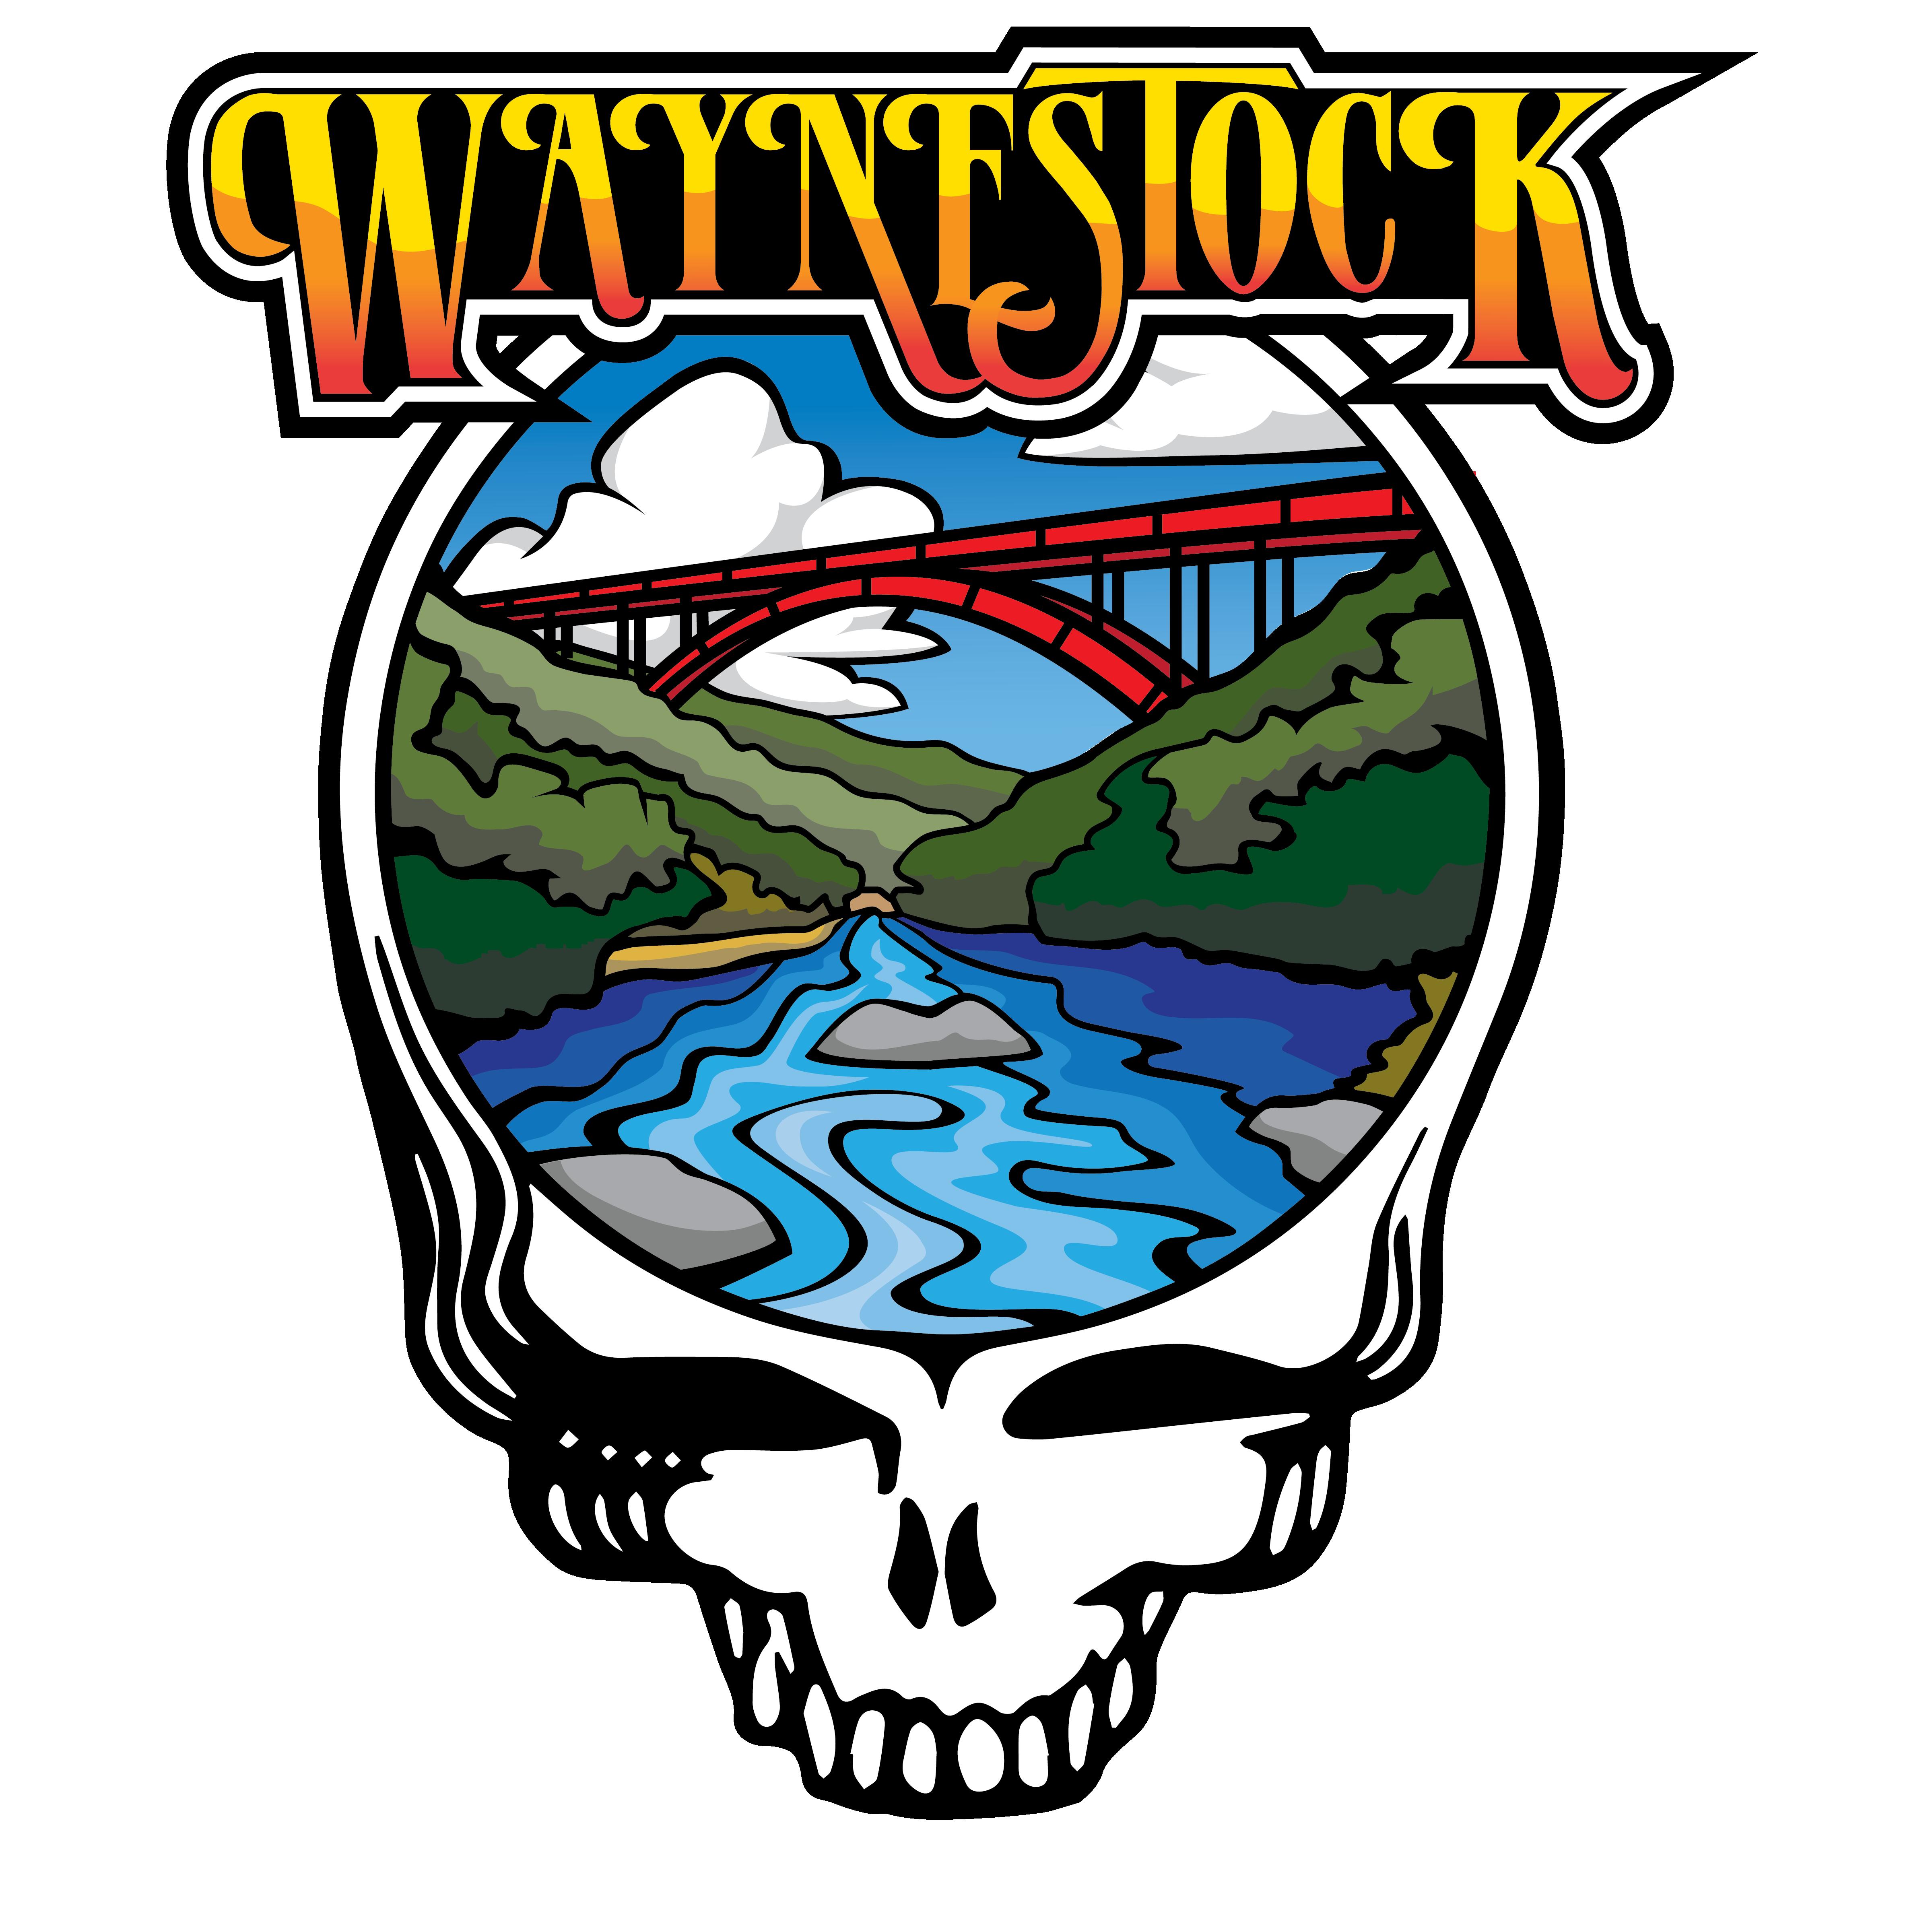 Waynestock Outdoor Adventure & Music Festival